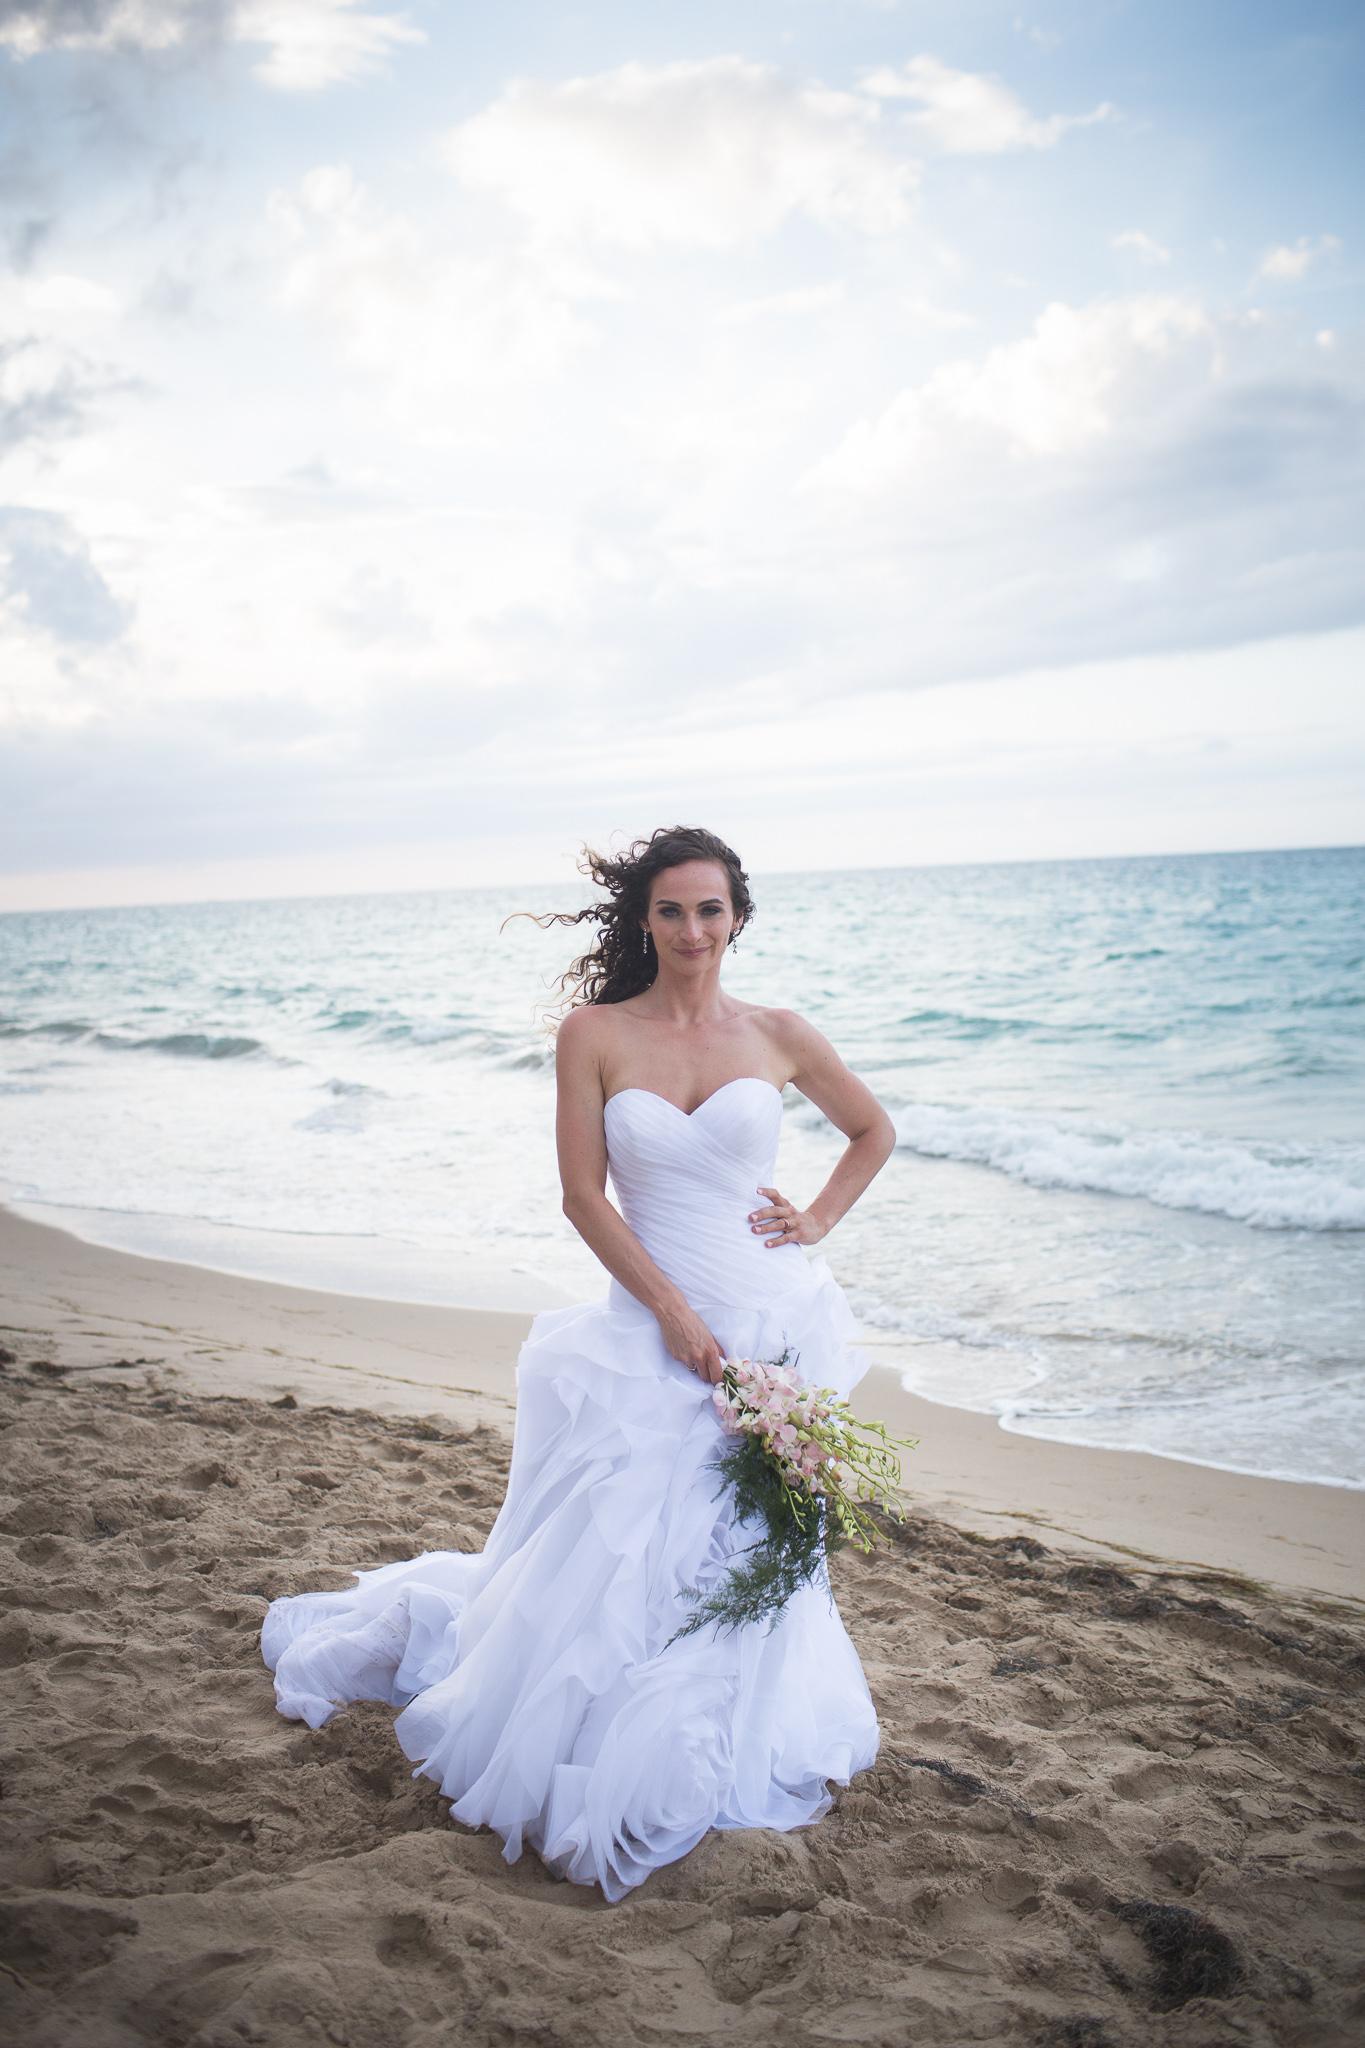 089-best-detroit-michigan-outdoor-destination-wedding-photographer.jpg